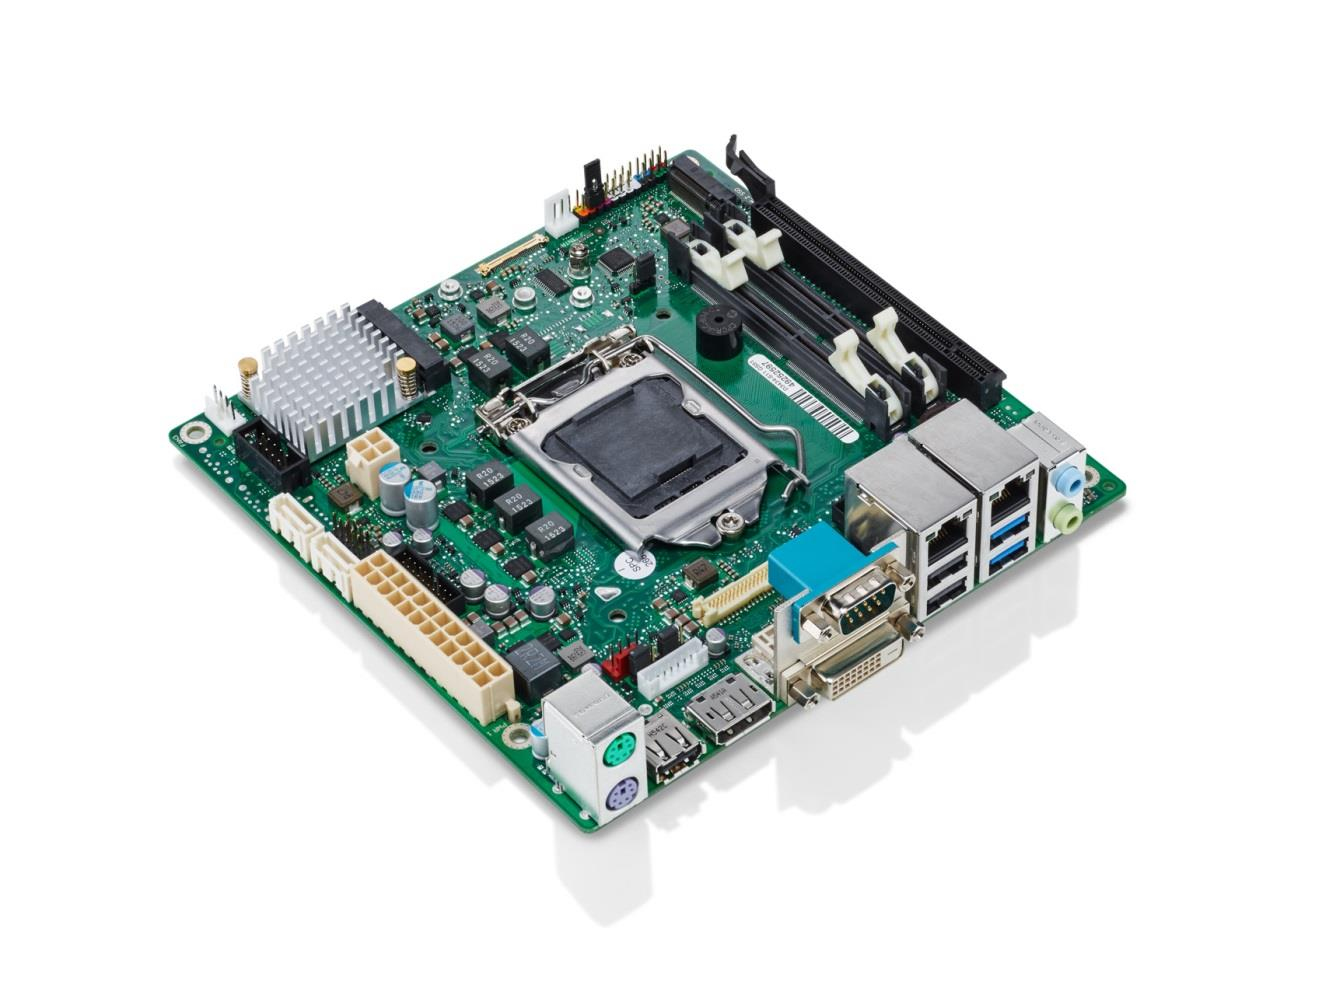 Fujitsu D3434-S22 Intel H170 LGA 1151 (Socket H4) Mini ITX motherboard